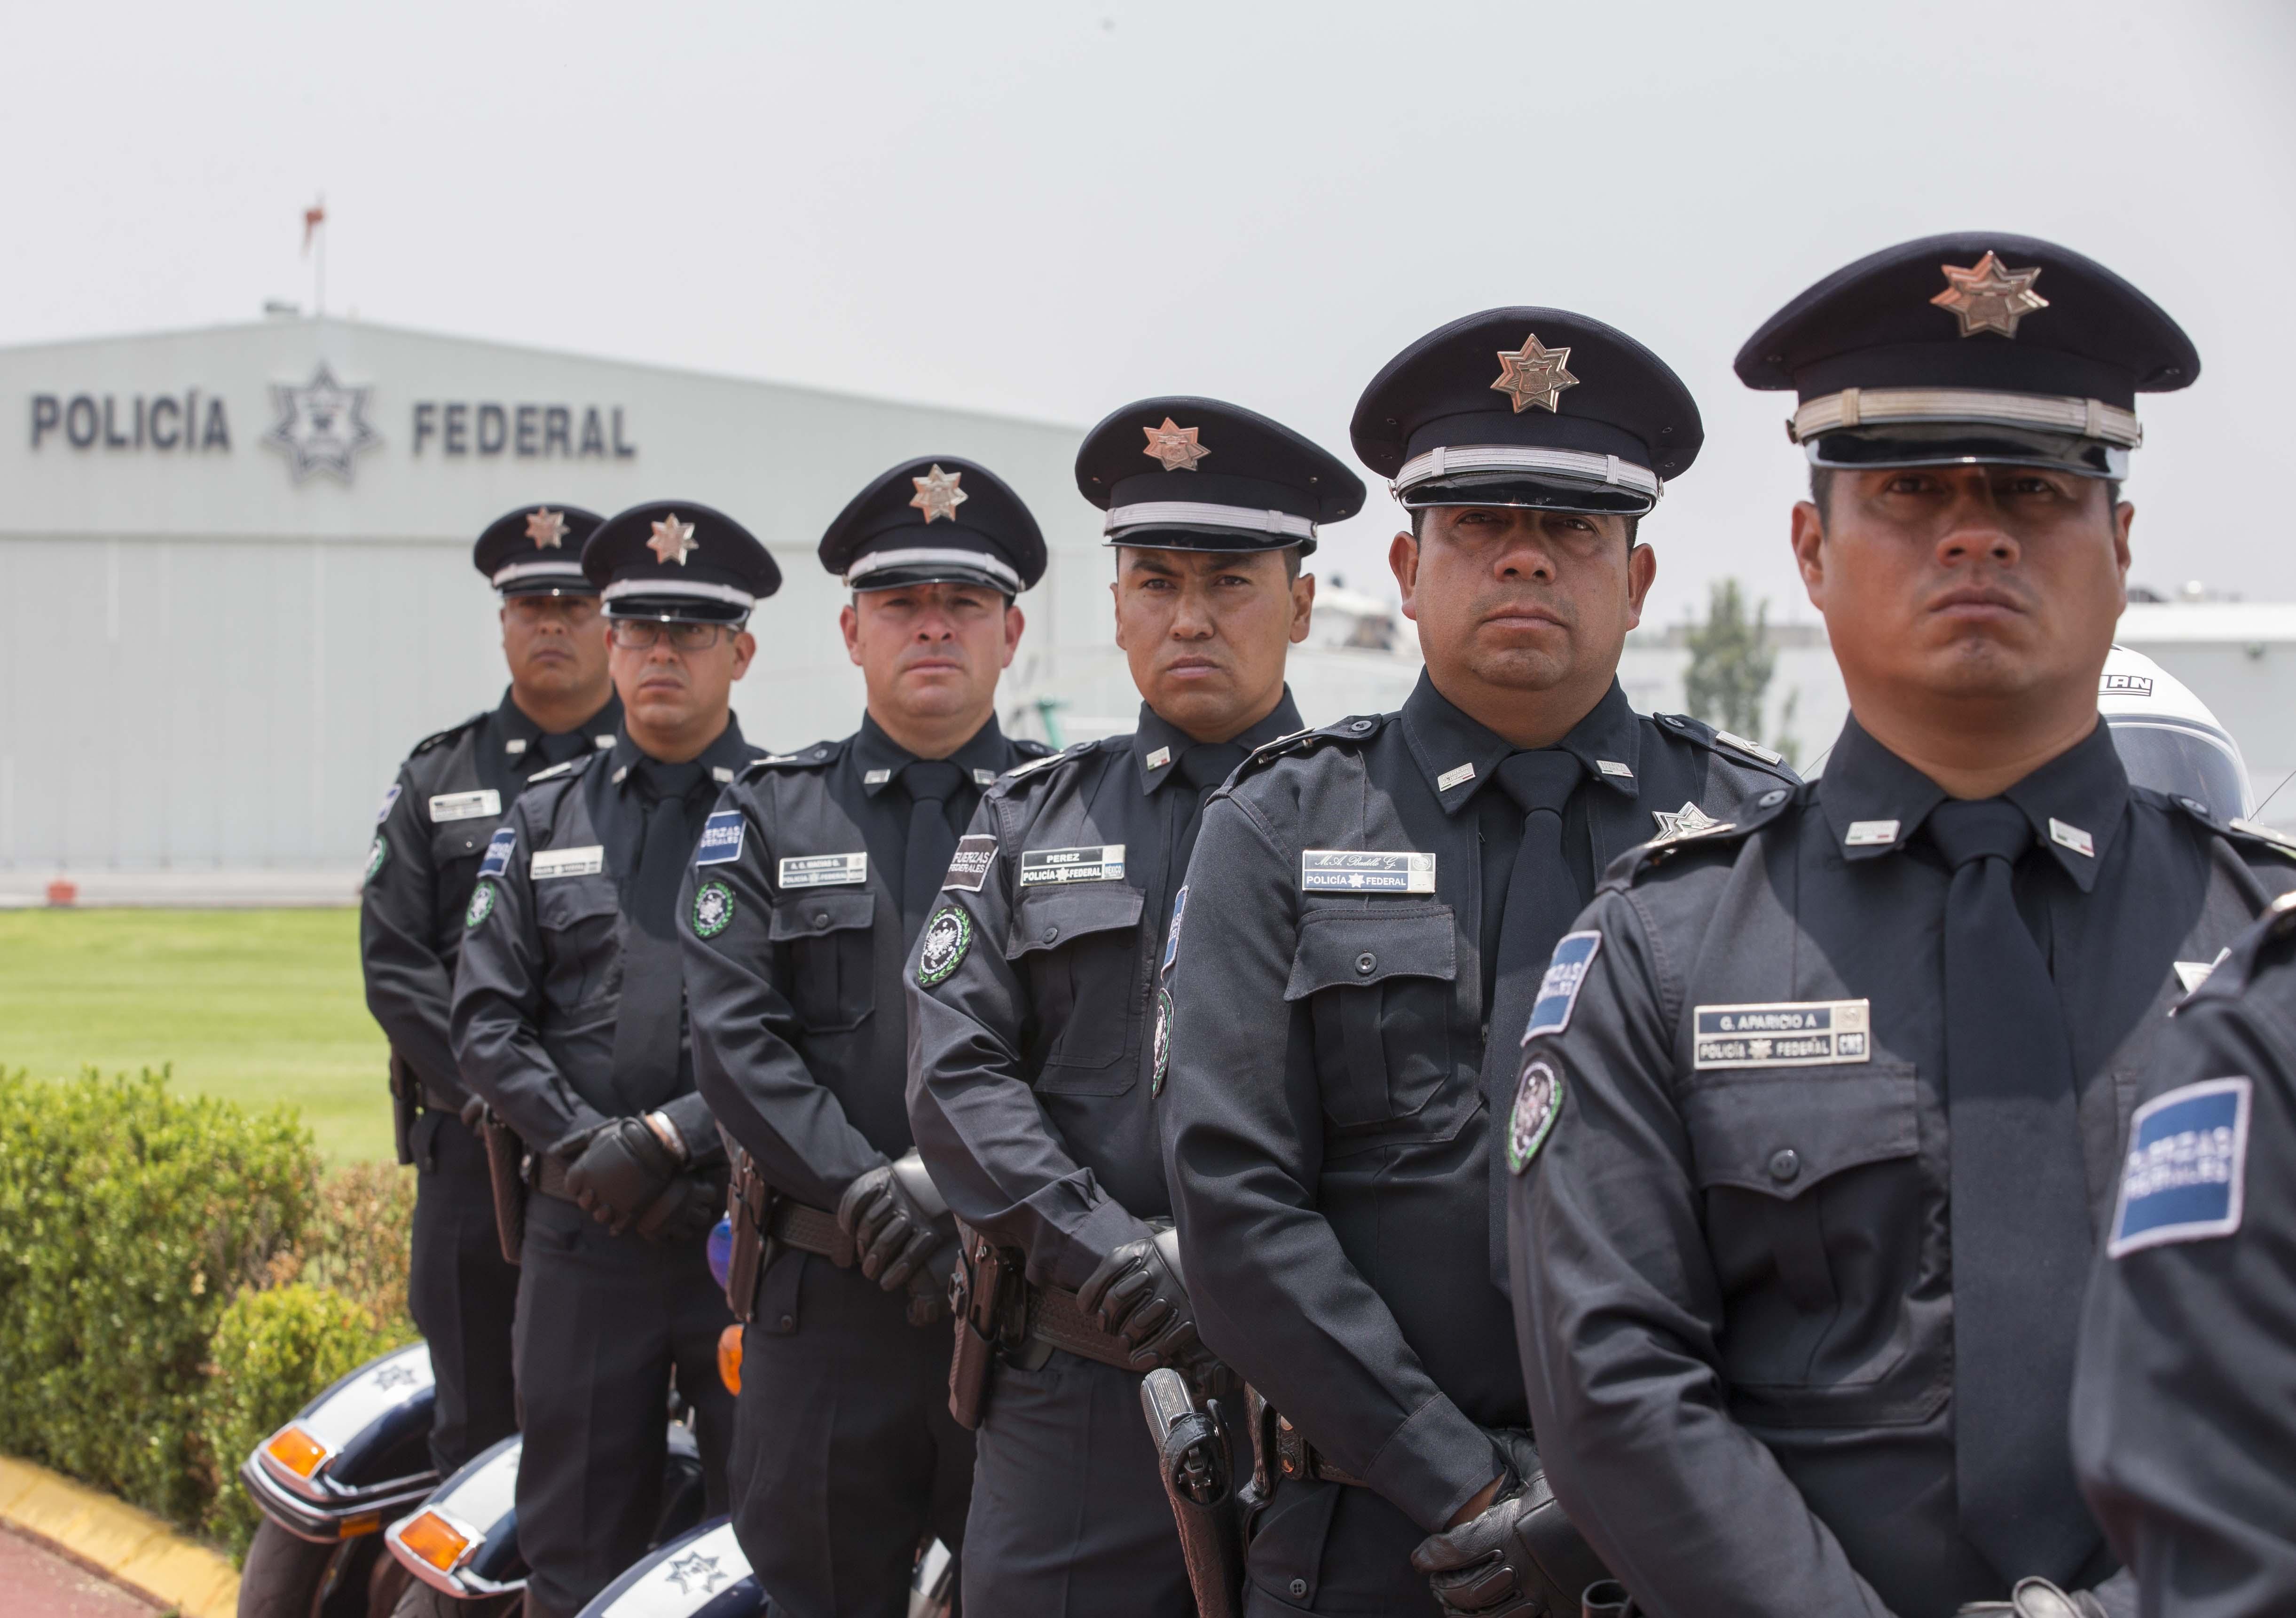 Policía Federal México Wikipedia La Enciclopedia Libre